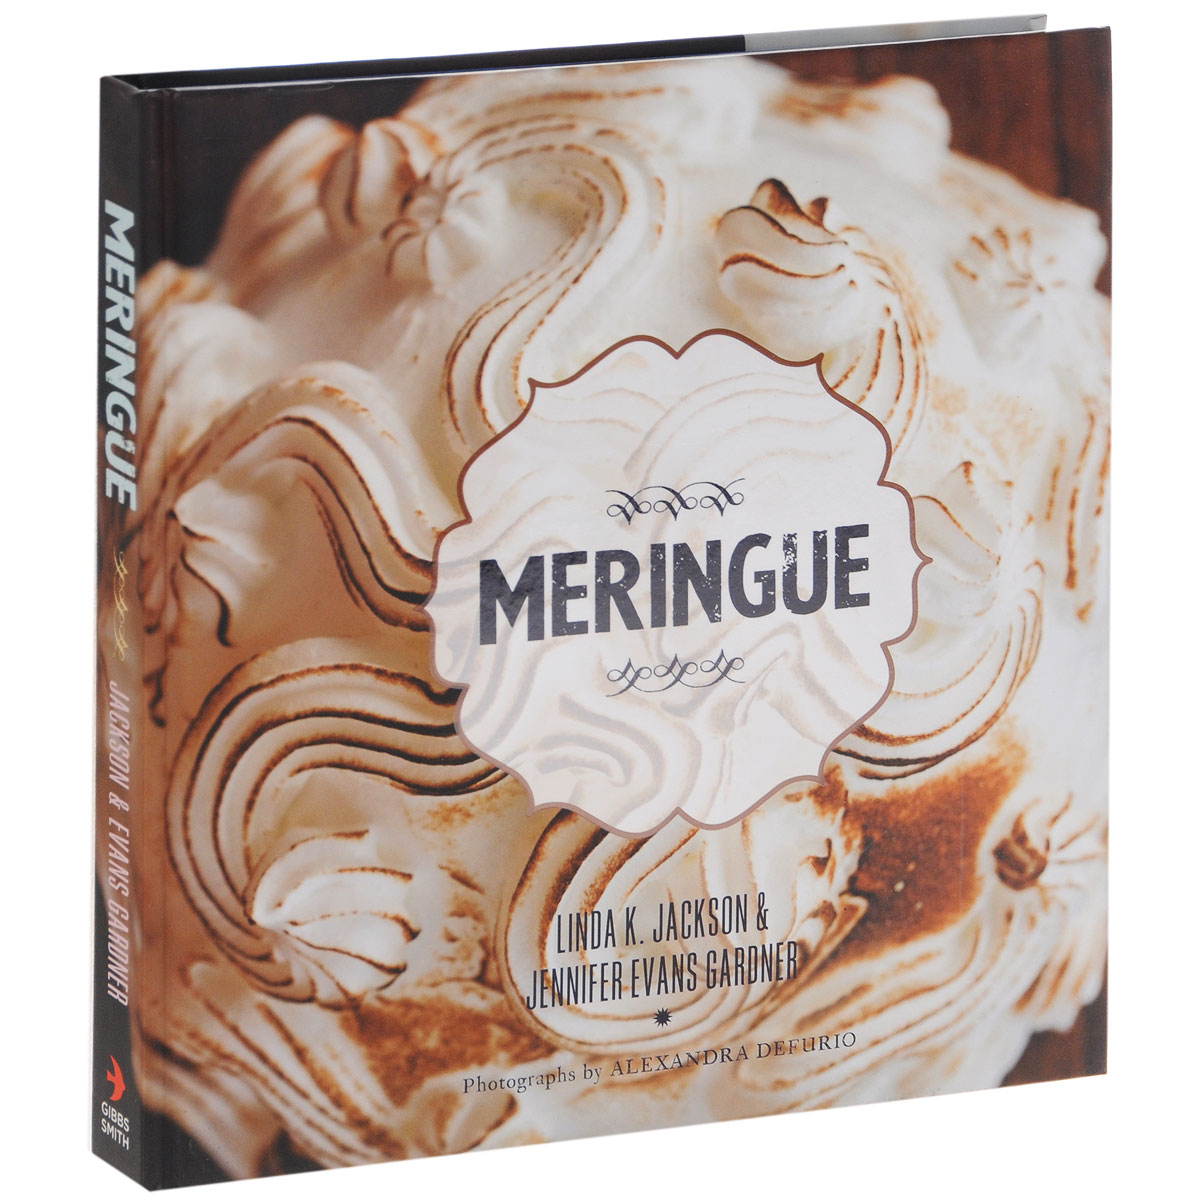 Meringue 200cmx250cm customized tye die muslin backdrop just let us know model number or product id of advertised one buy it directly